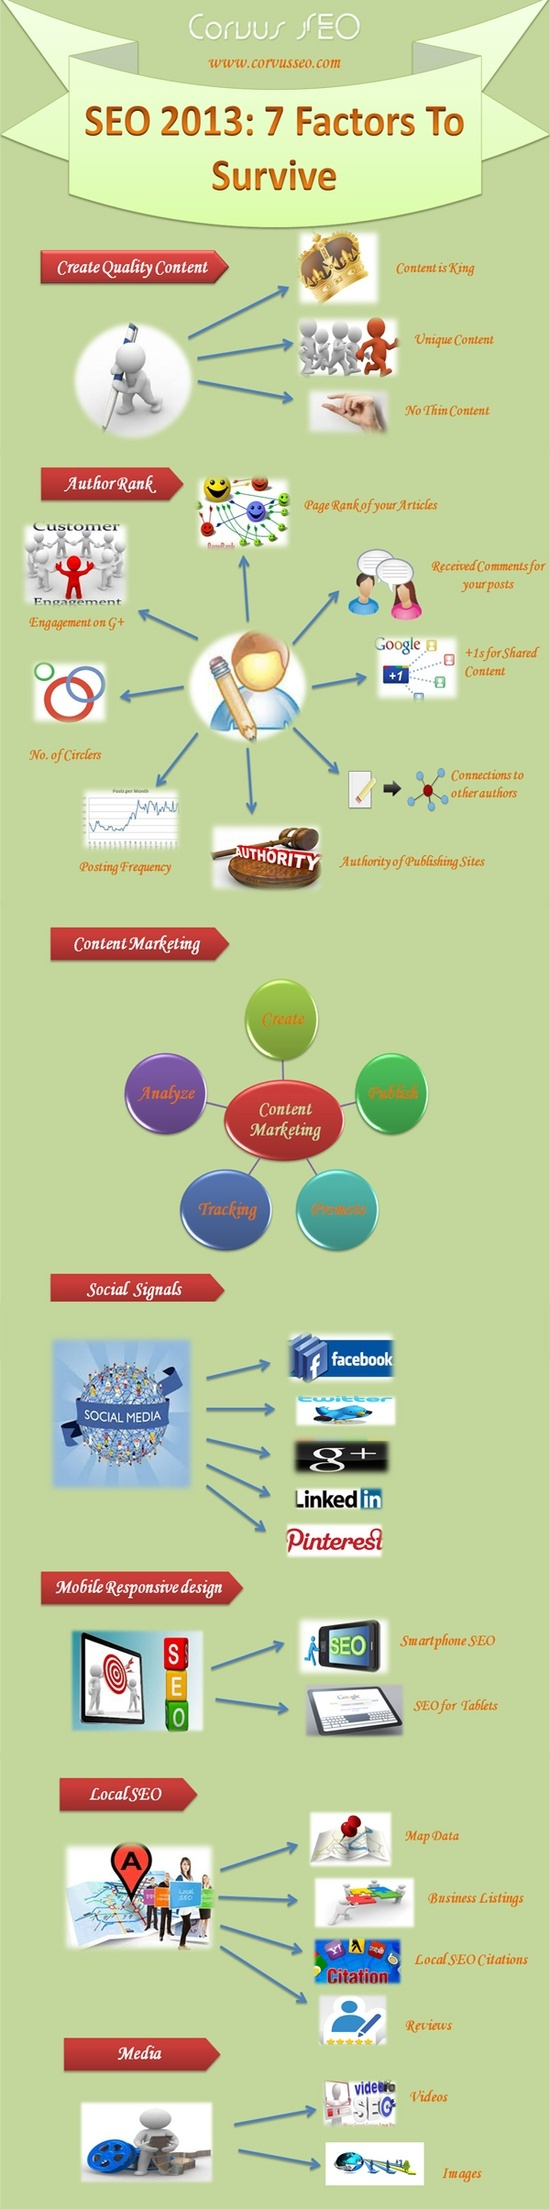 SEO 2013 #HOM3 Handboek Online Marketing